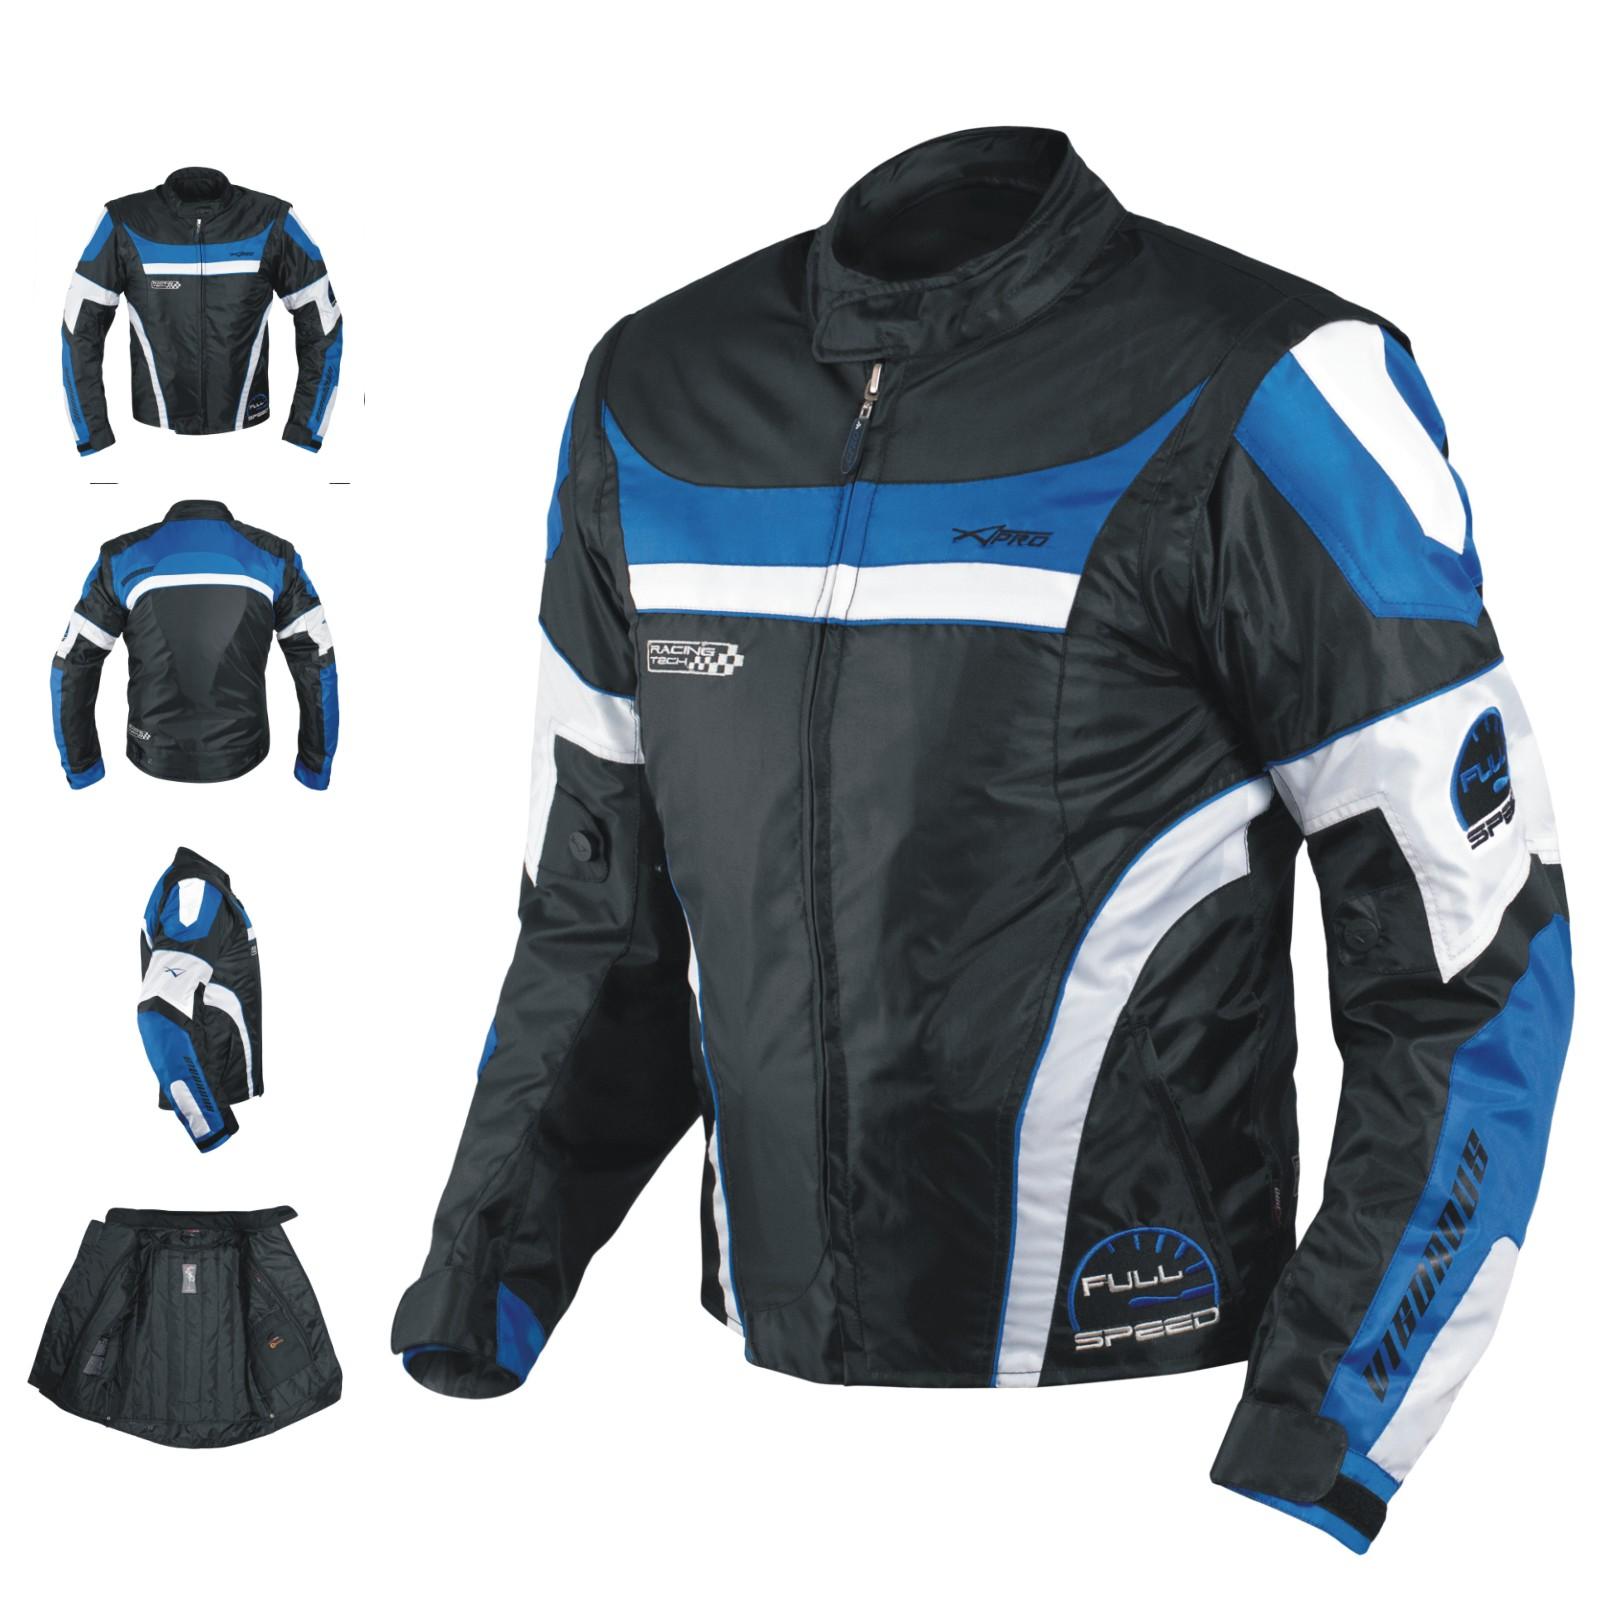 Blouson-Oxford-Nylon-Homme-Textile-CE-Protections-Thermique-Moto-Scooter